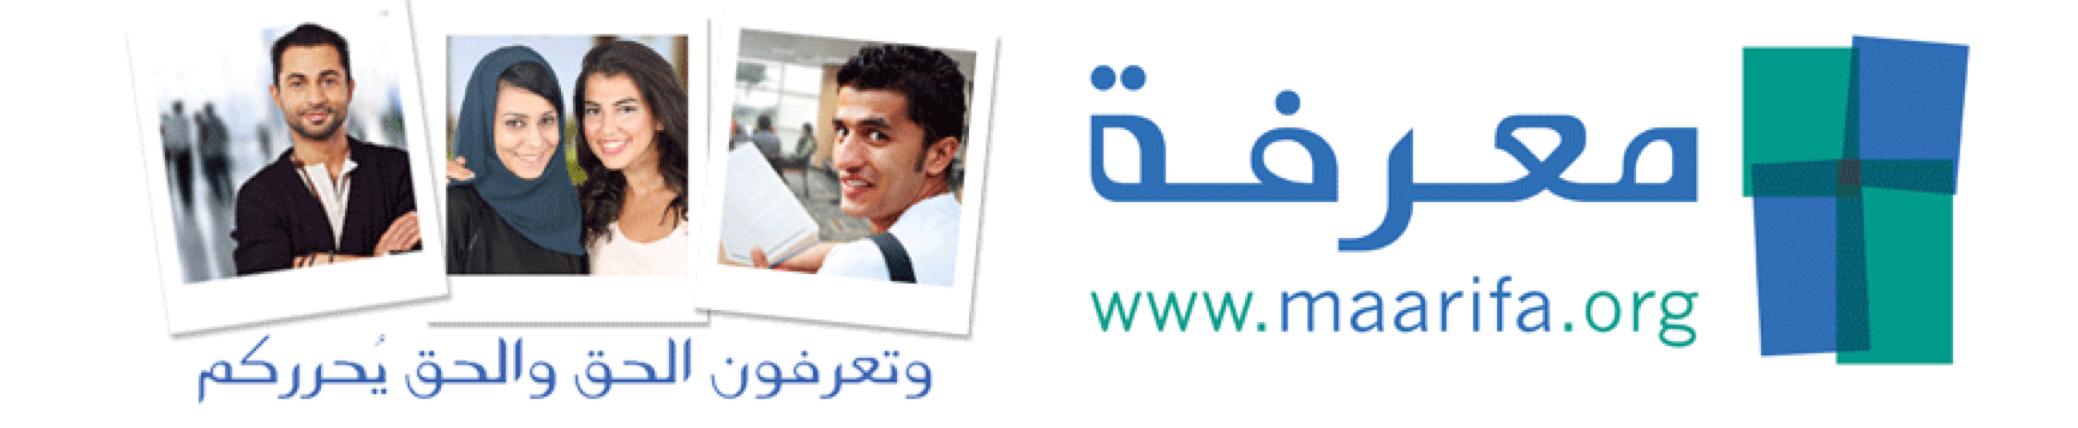 maarifa.org.png